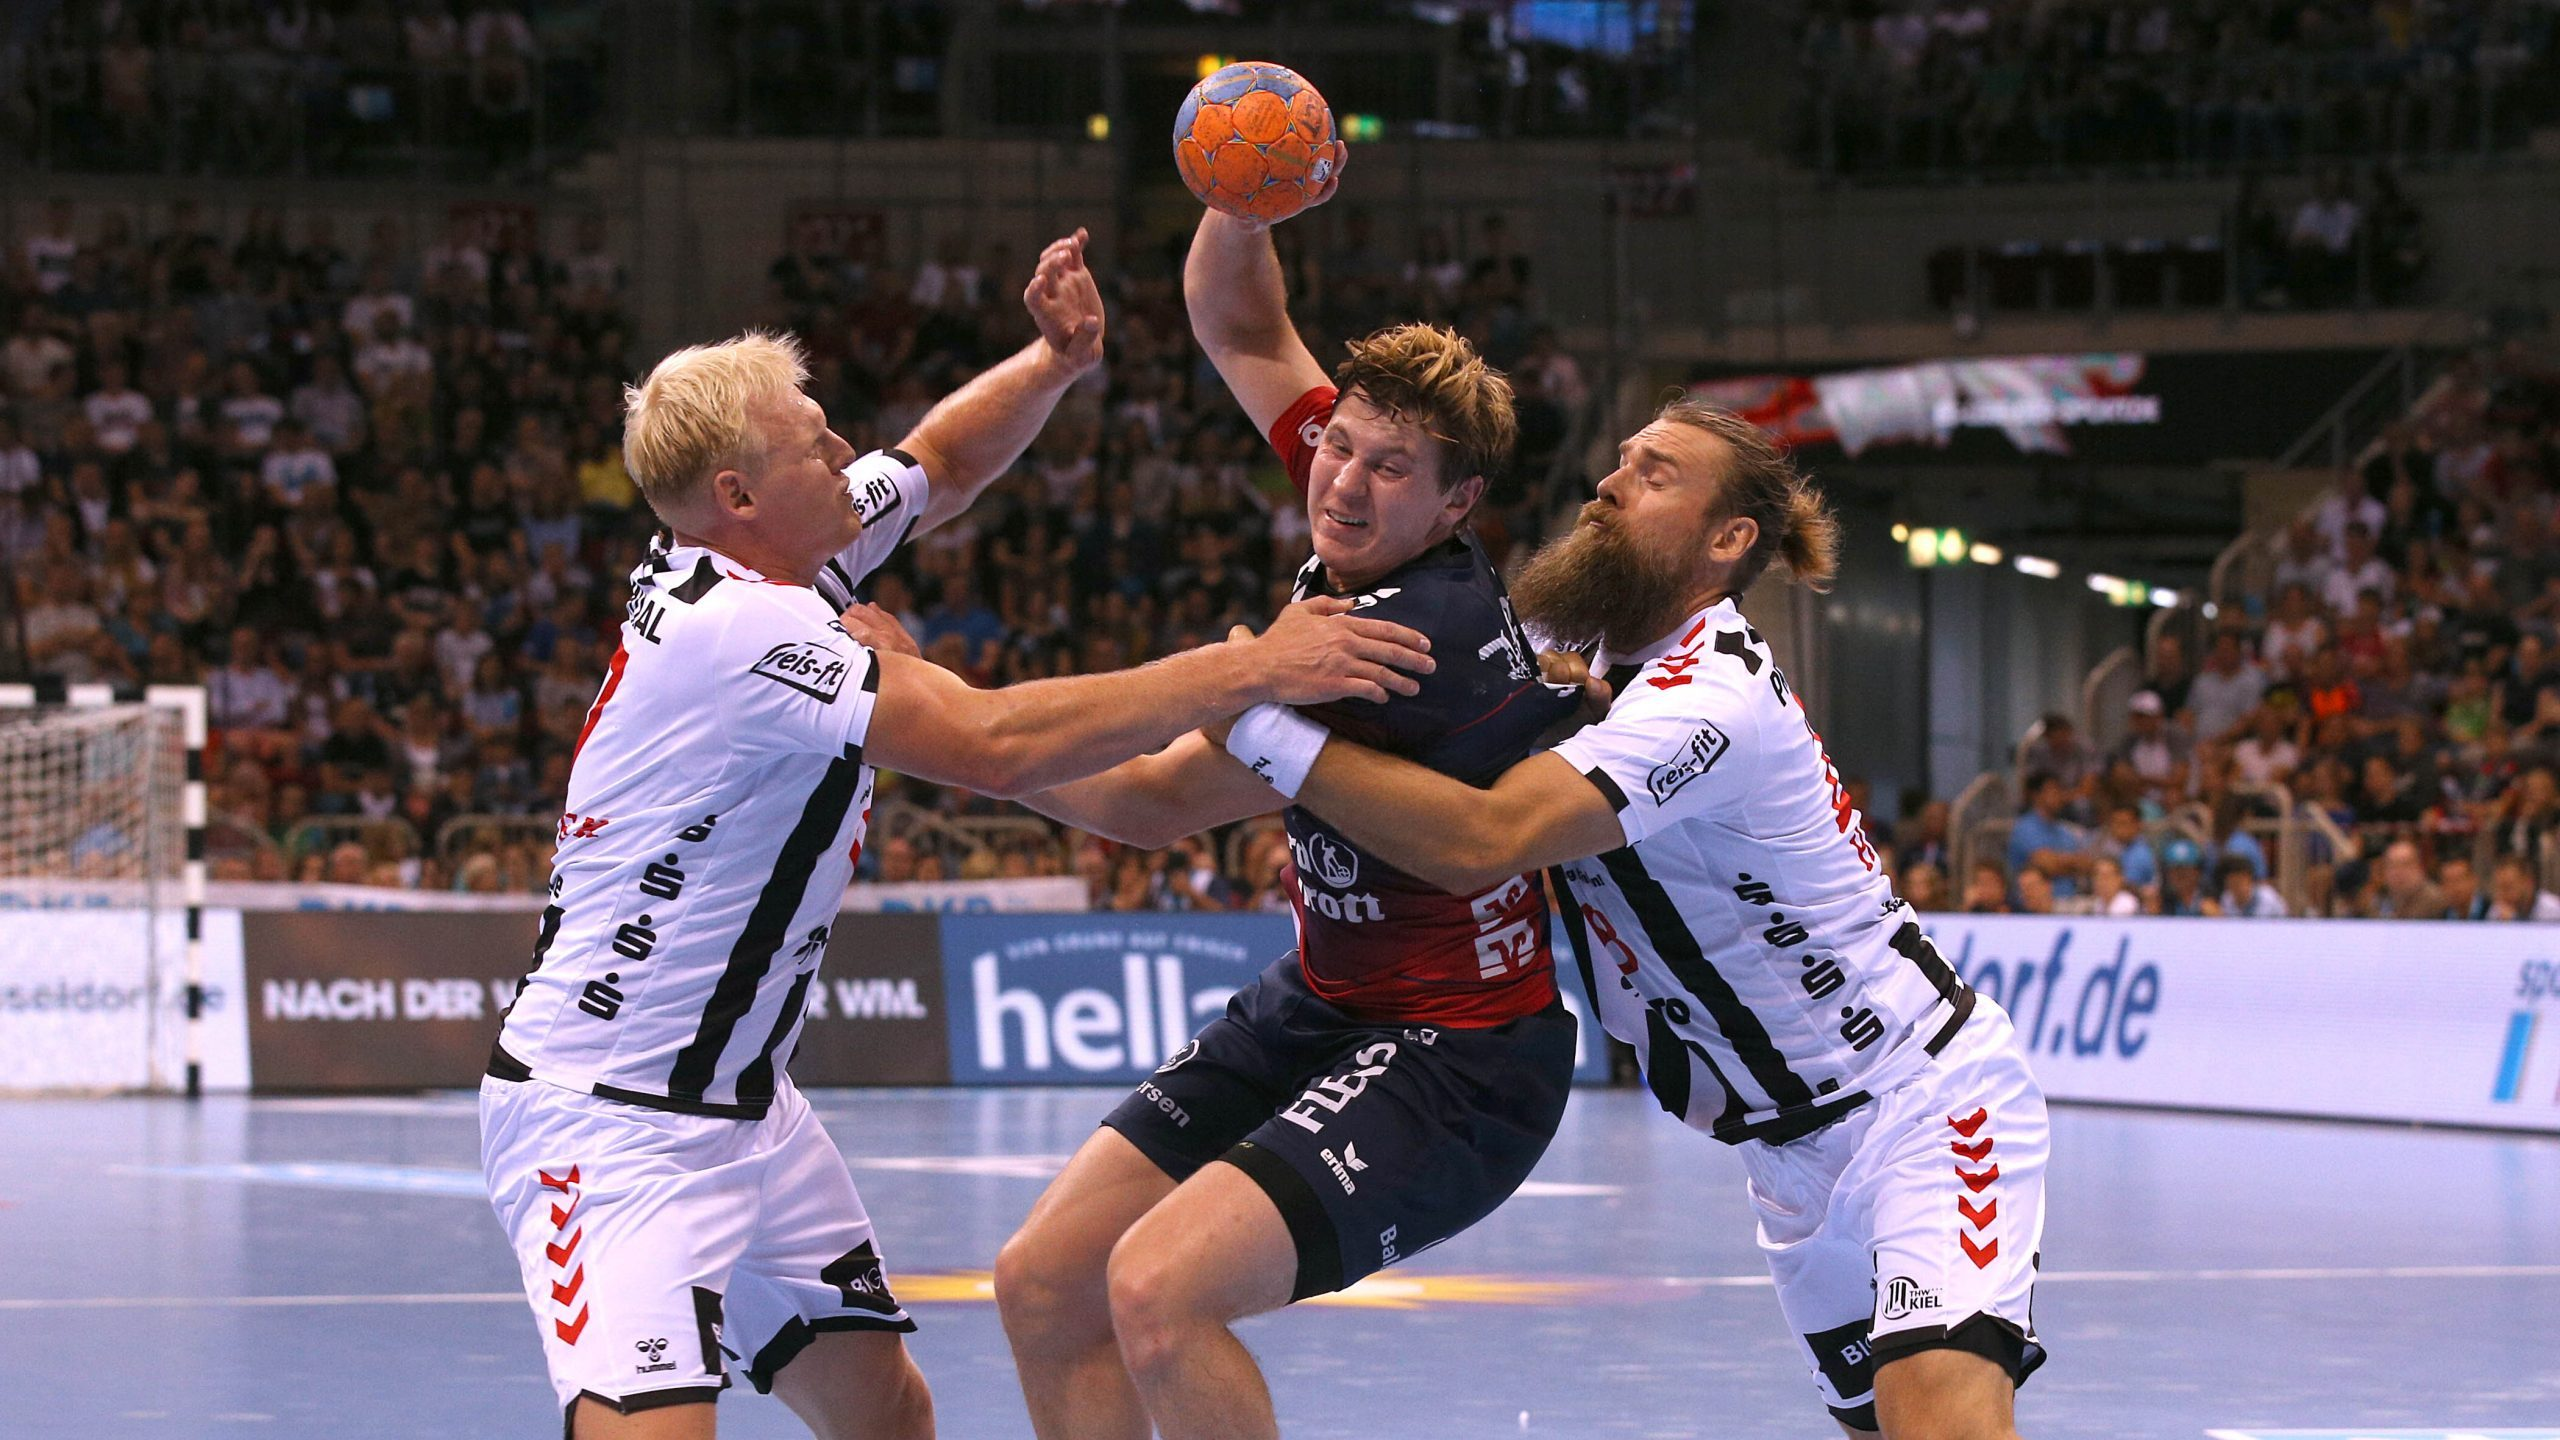 Weltklasse-Handball im ISS Dome